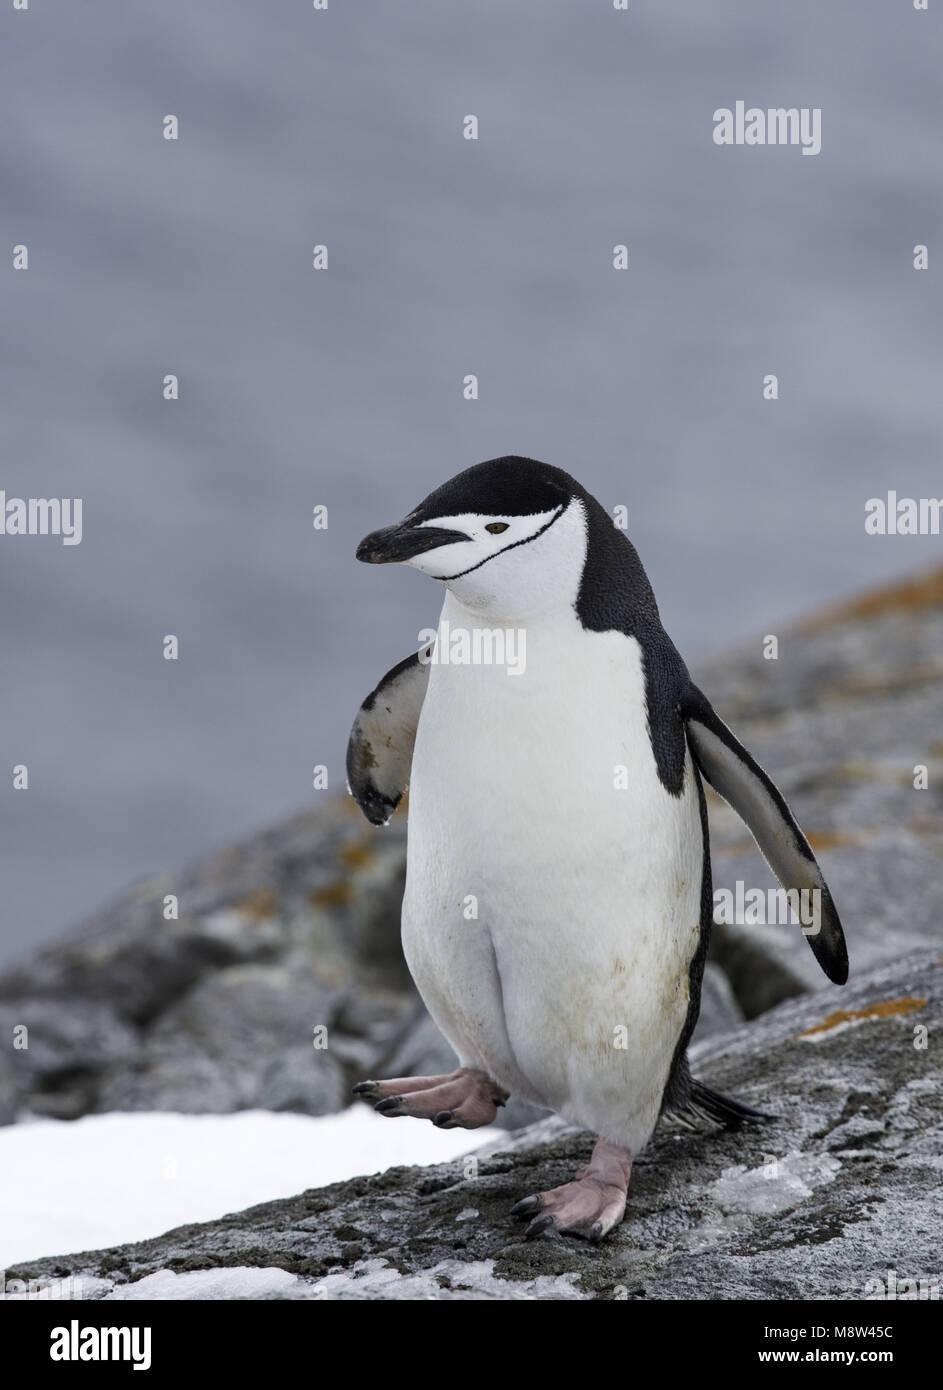 Chinstrap Penguin, Keelbandpinguin, Pygoscelis antarcticus Stock Photo